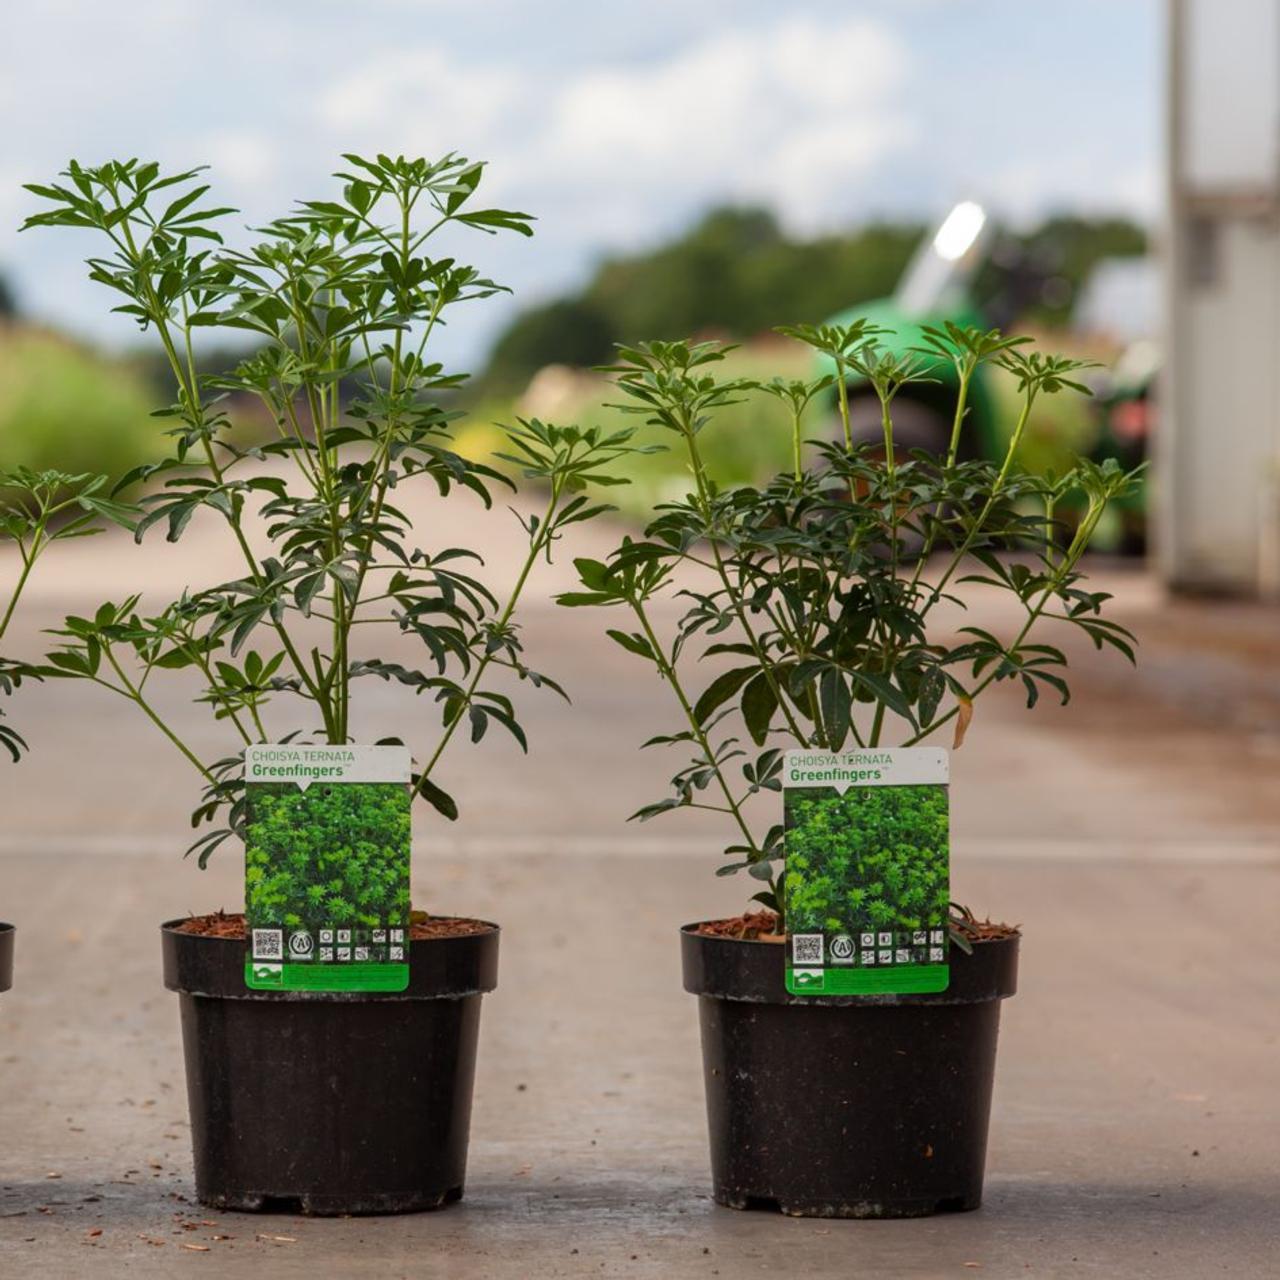 Choisya ternata 'Greenfingers' plant